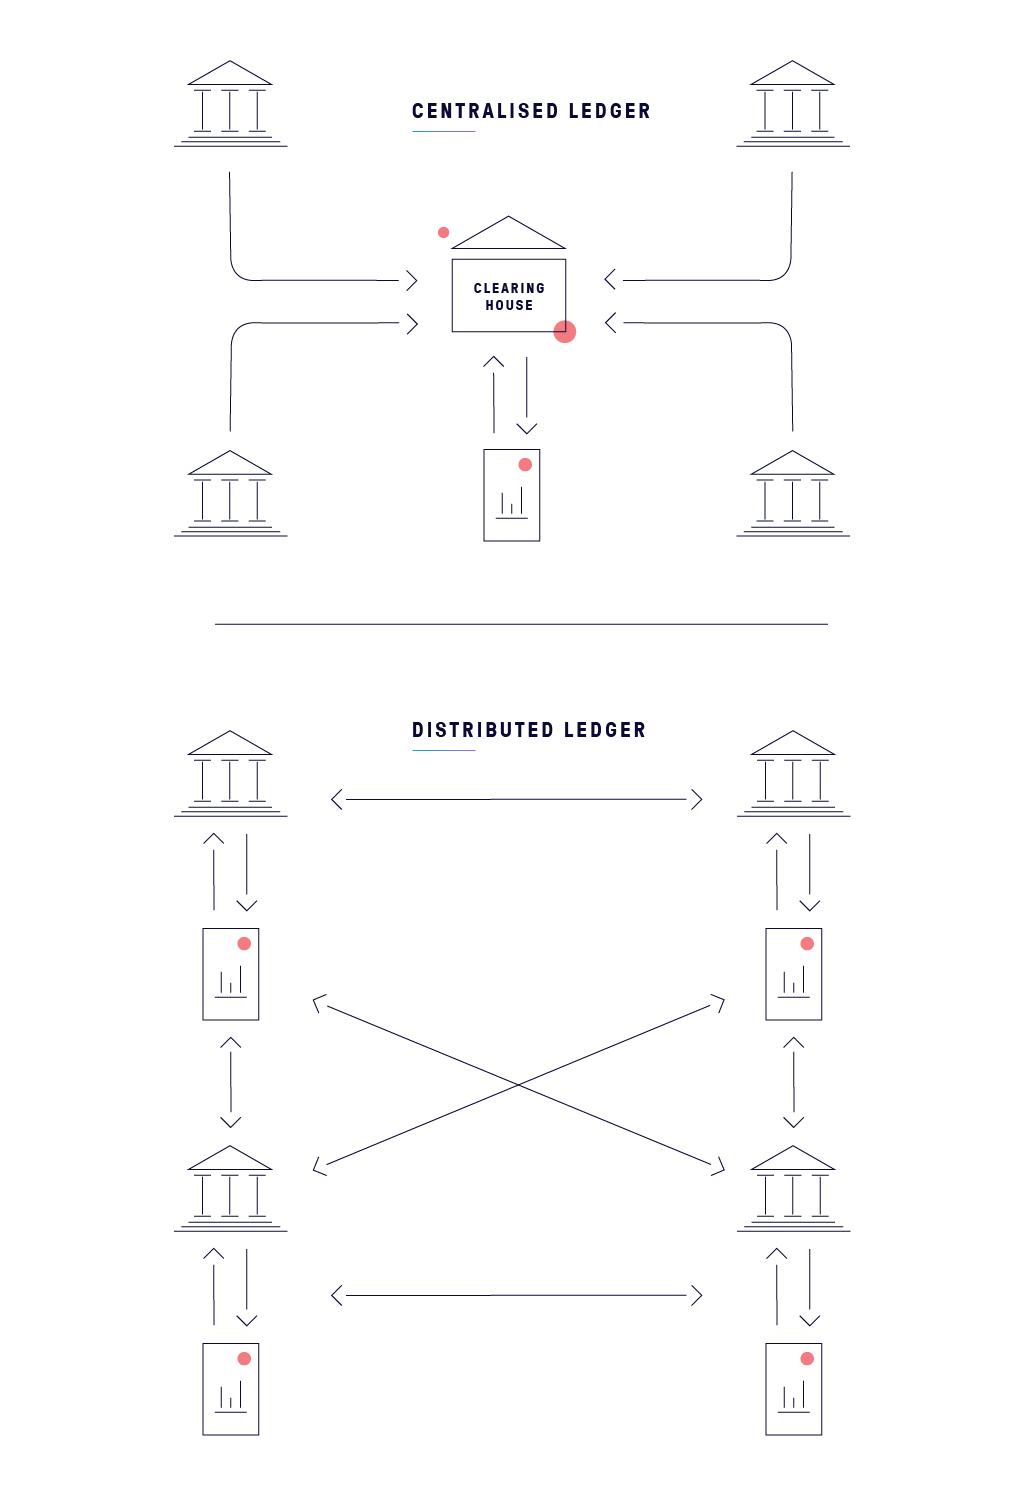 Centralized ledger vs distributed ledger